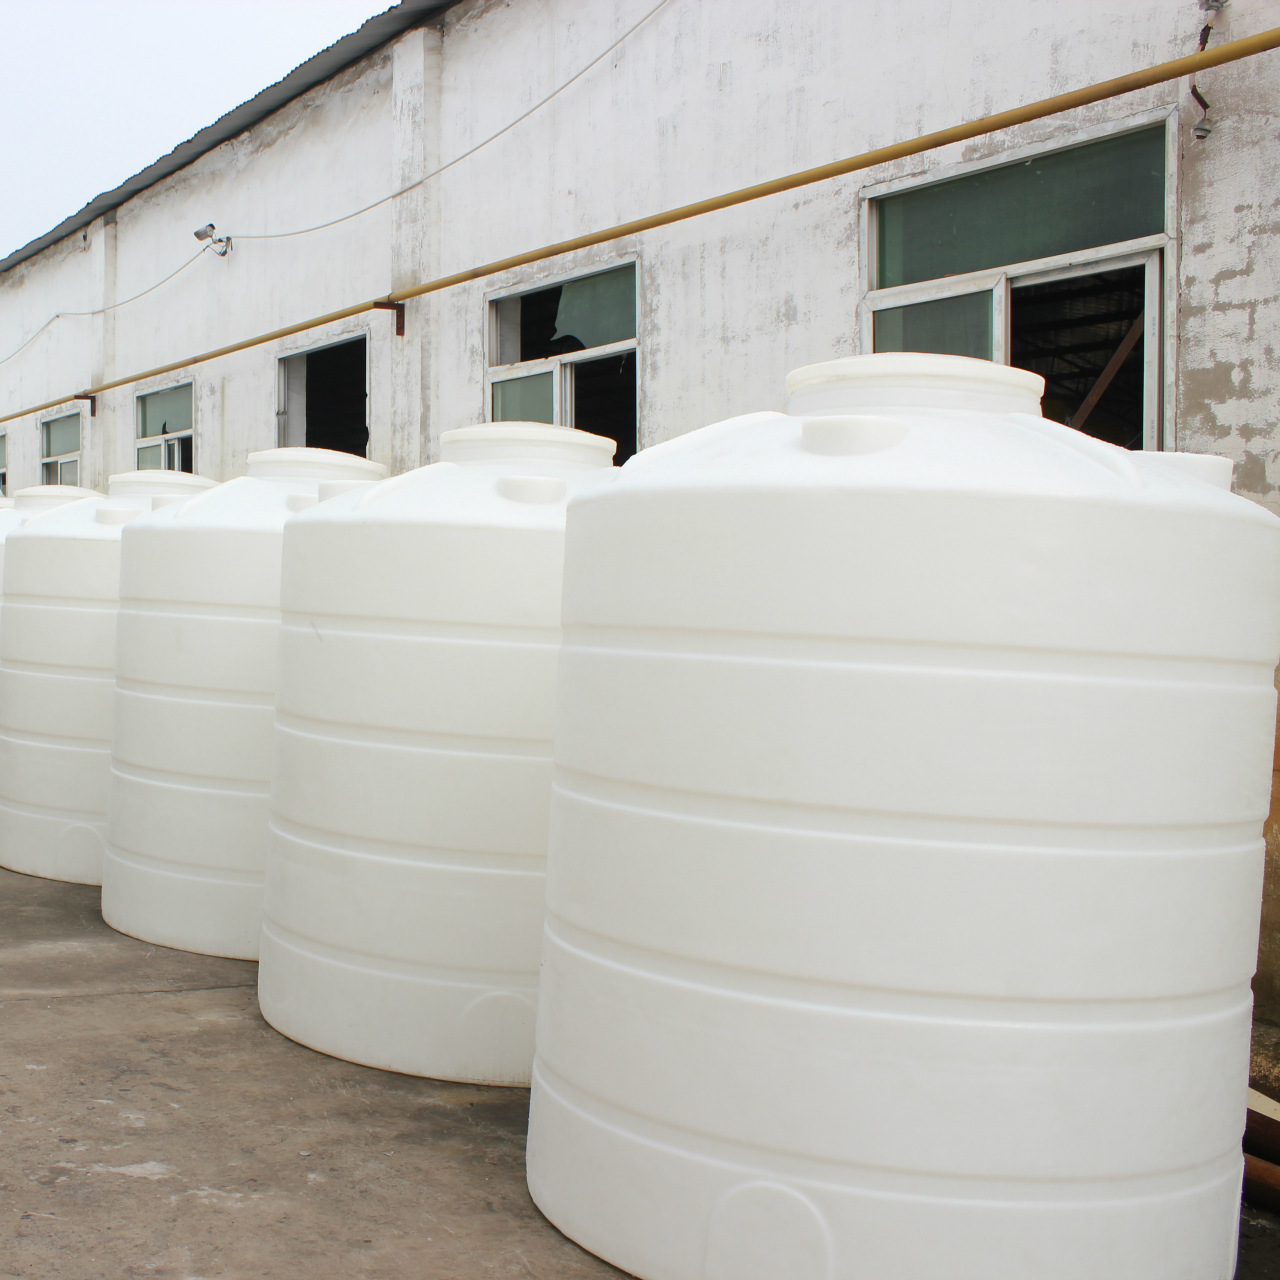 2000L水塔 环保塑料2吨水塔 大型塑料圆桶PE储罐塑料桶厂家直销